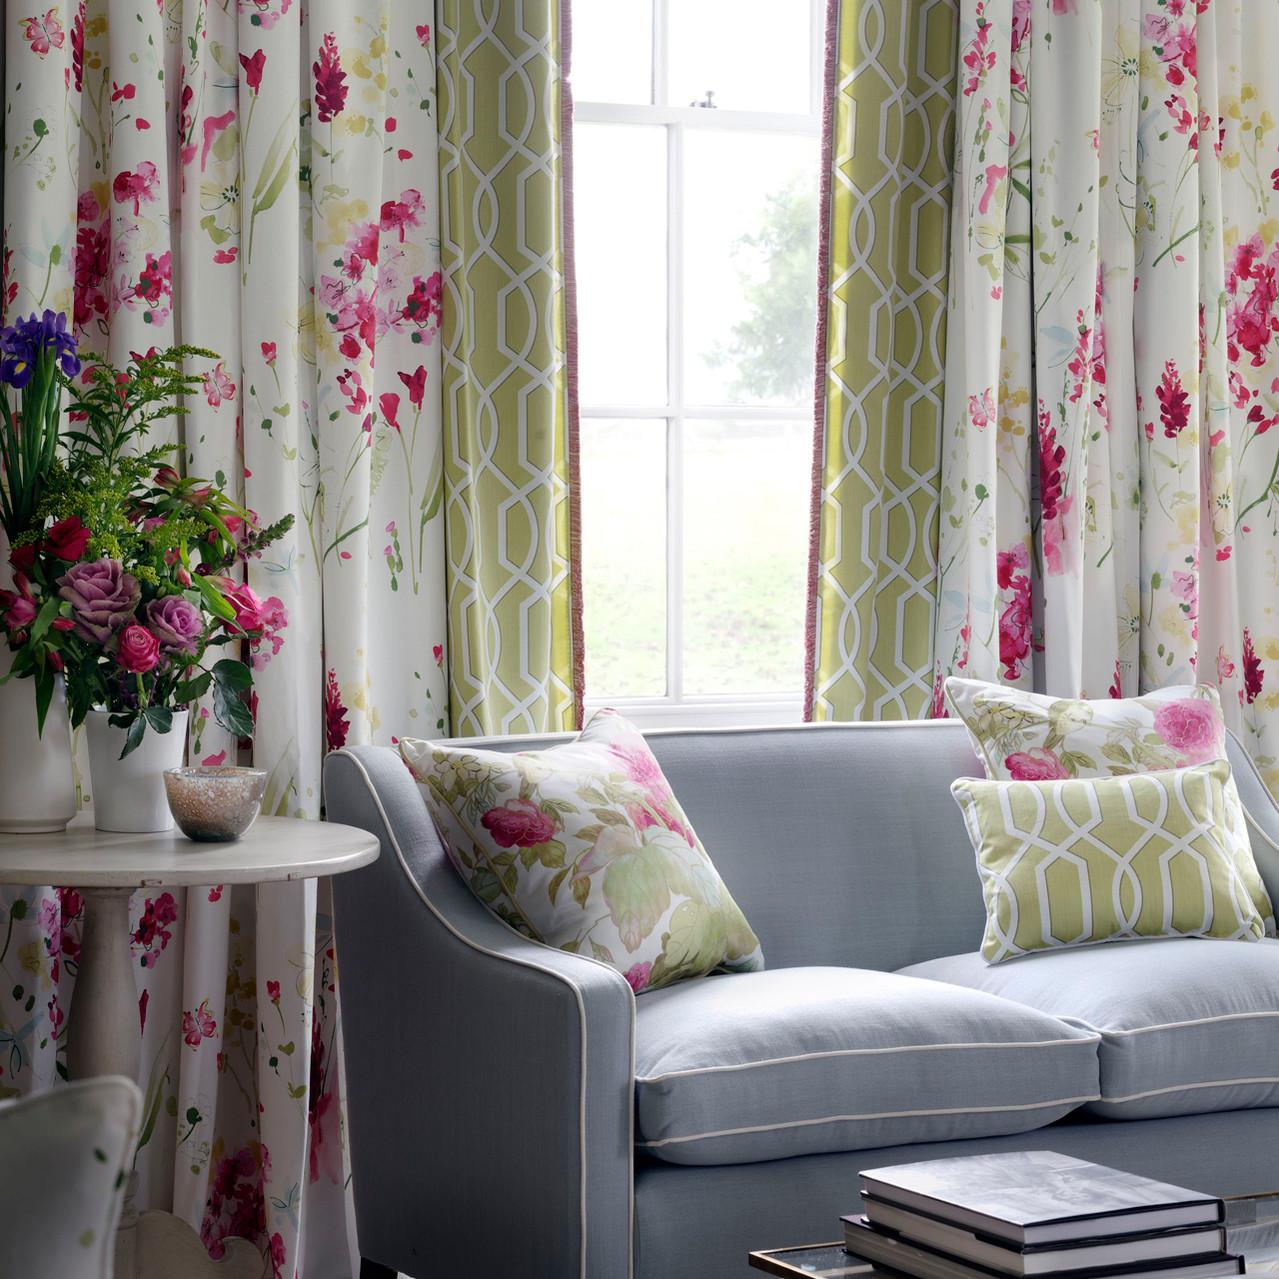 Meadow Flower curtains etc.